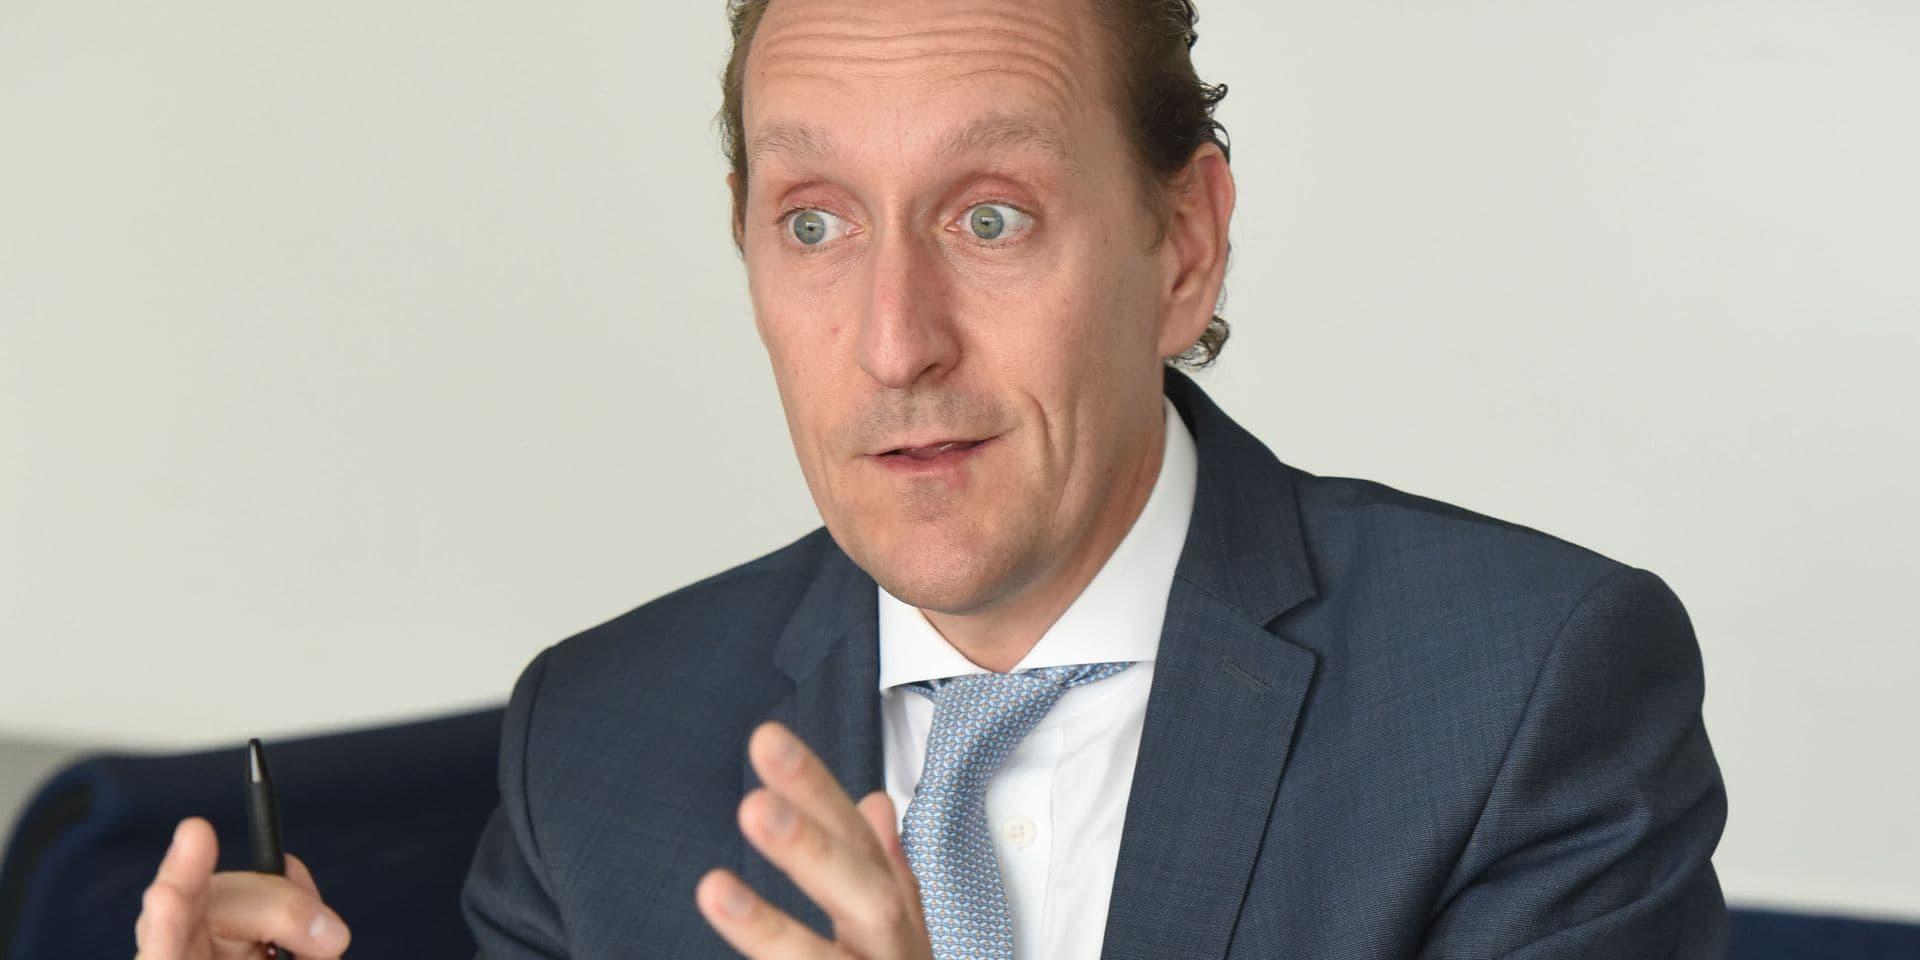 Dieter Vranckx